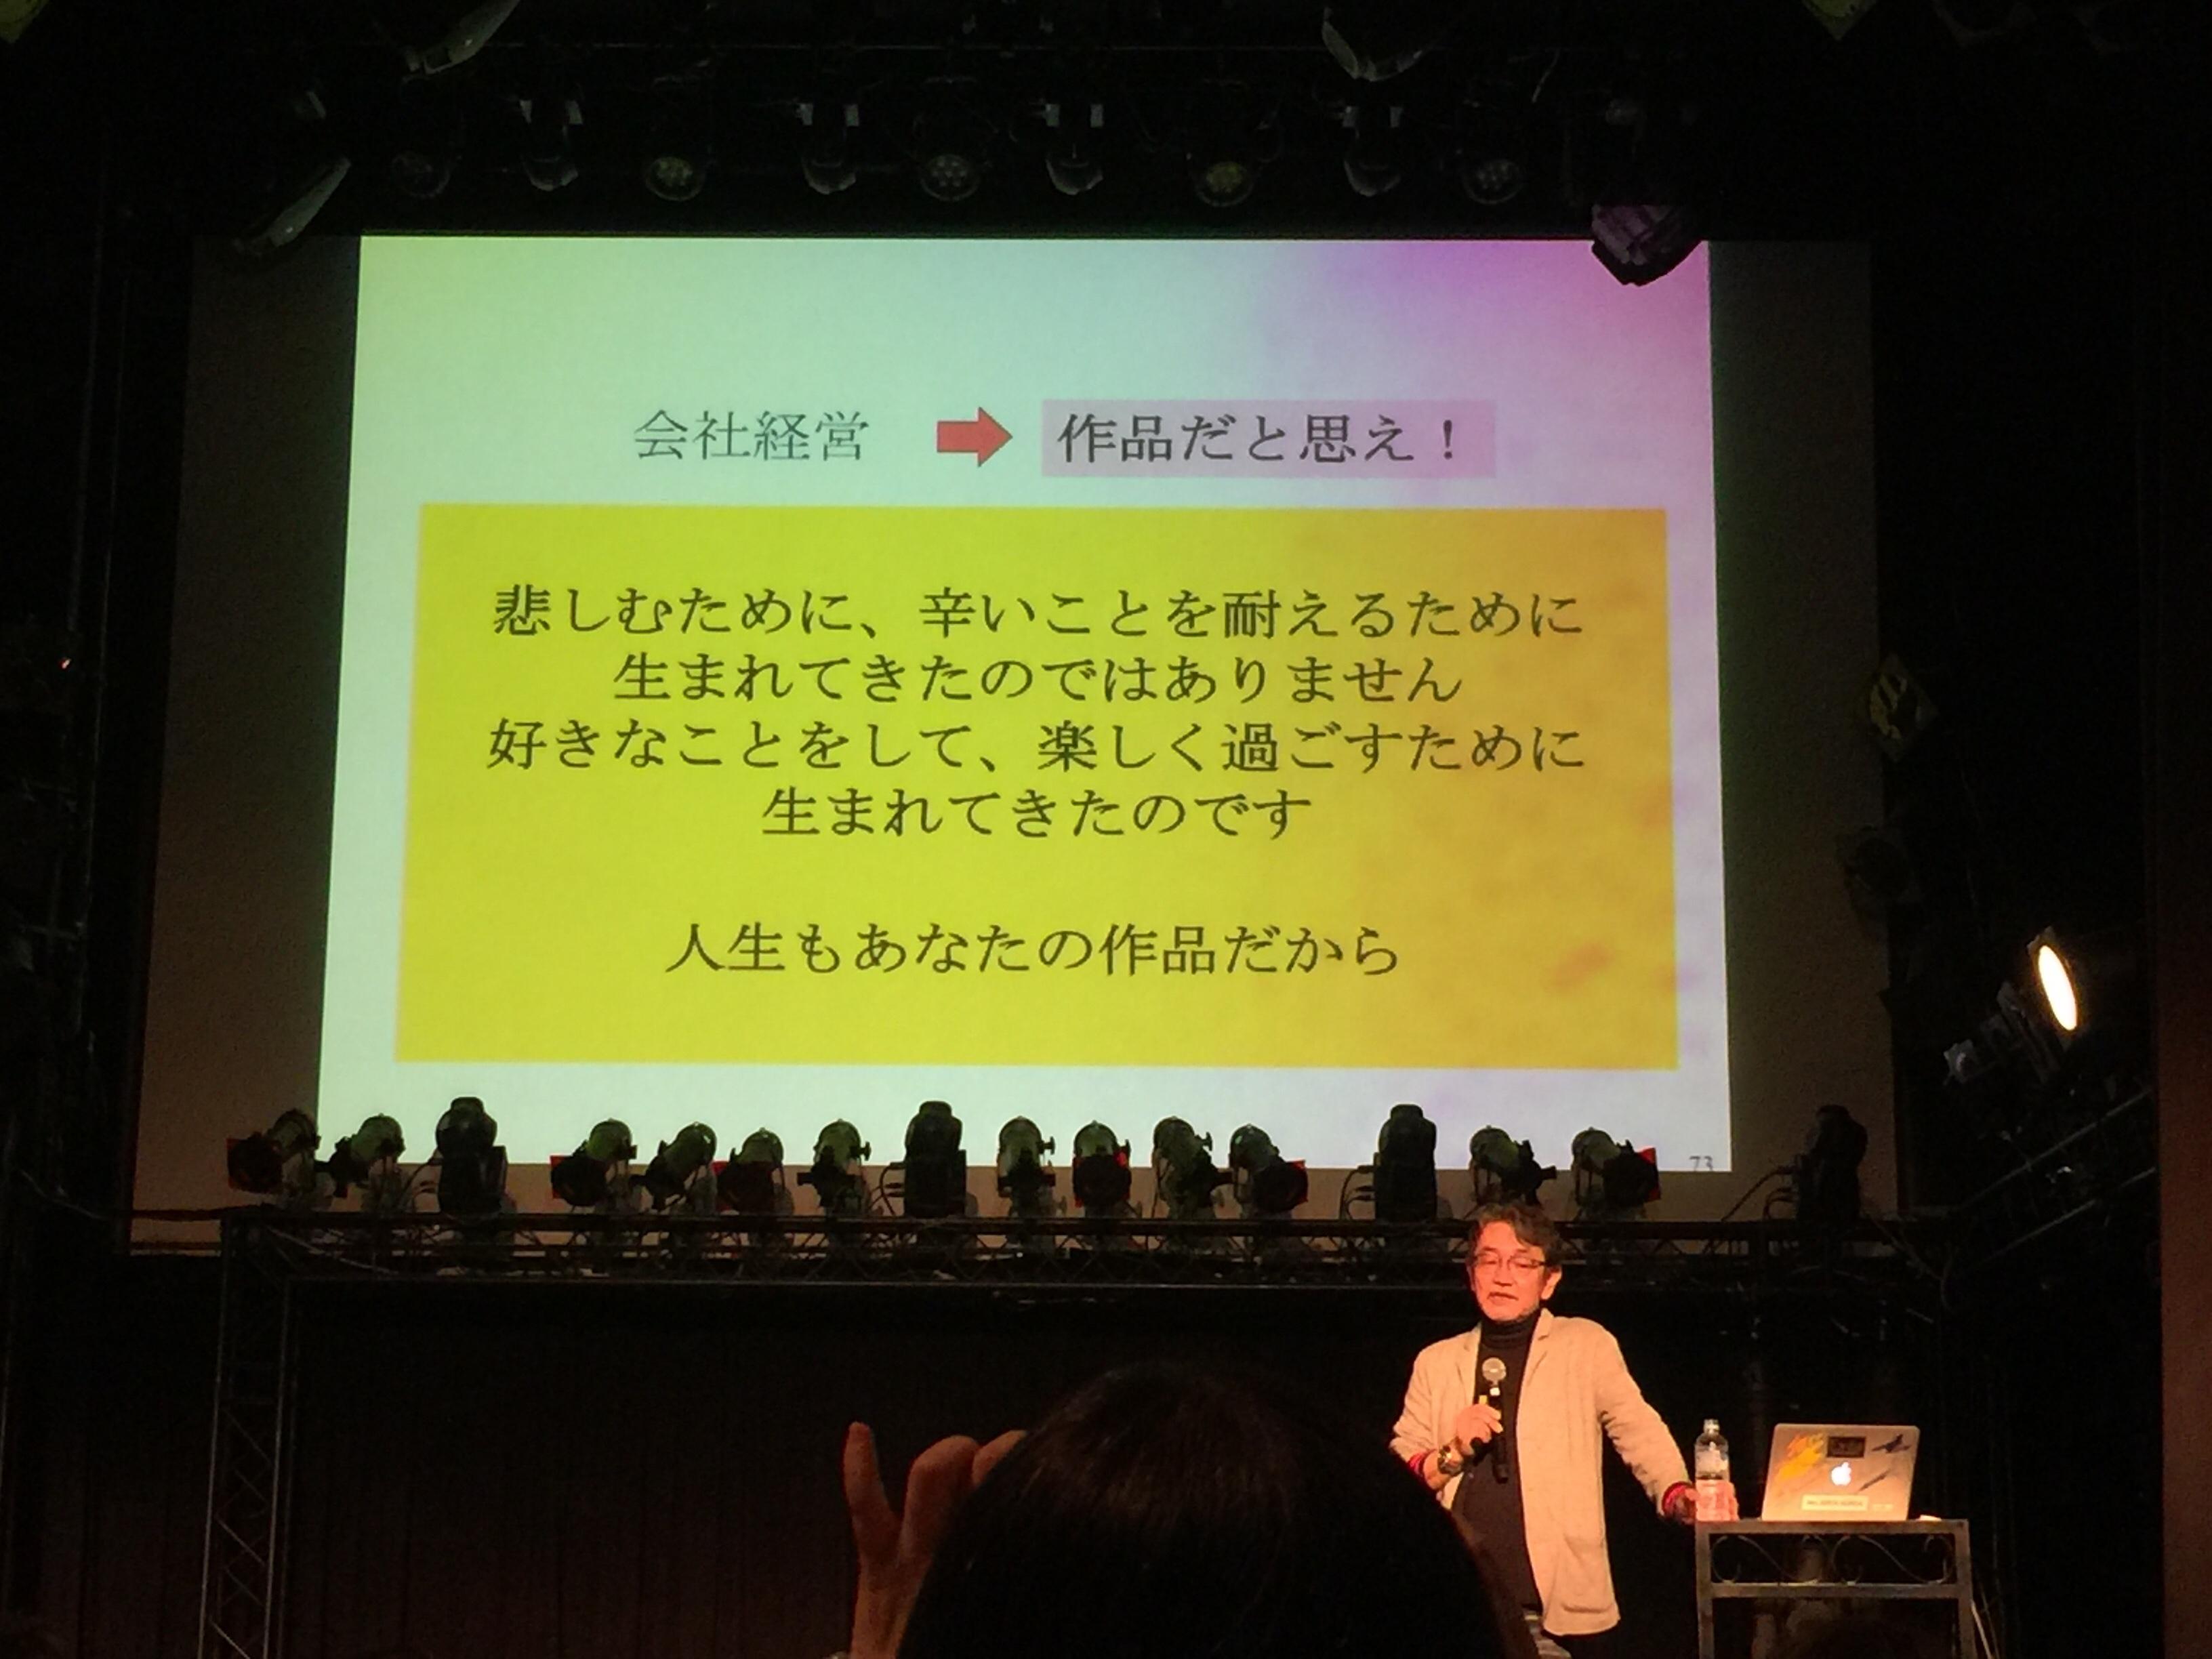 fc2blog_2017102101203382a.jpg